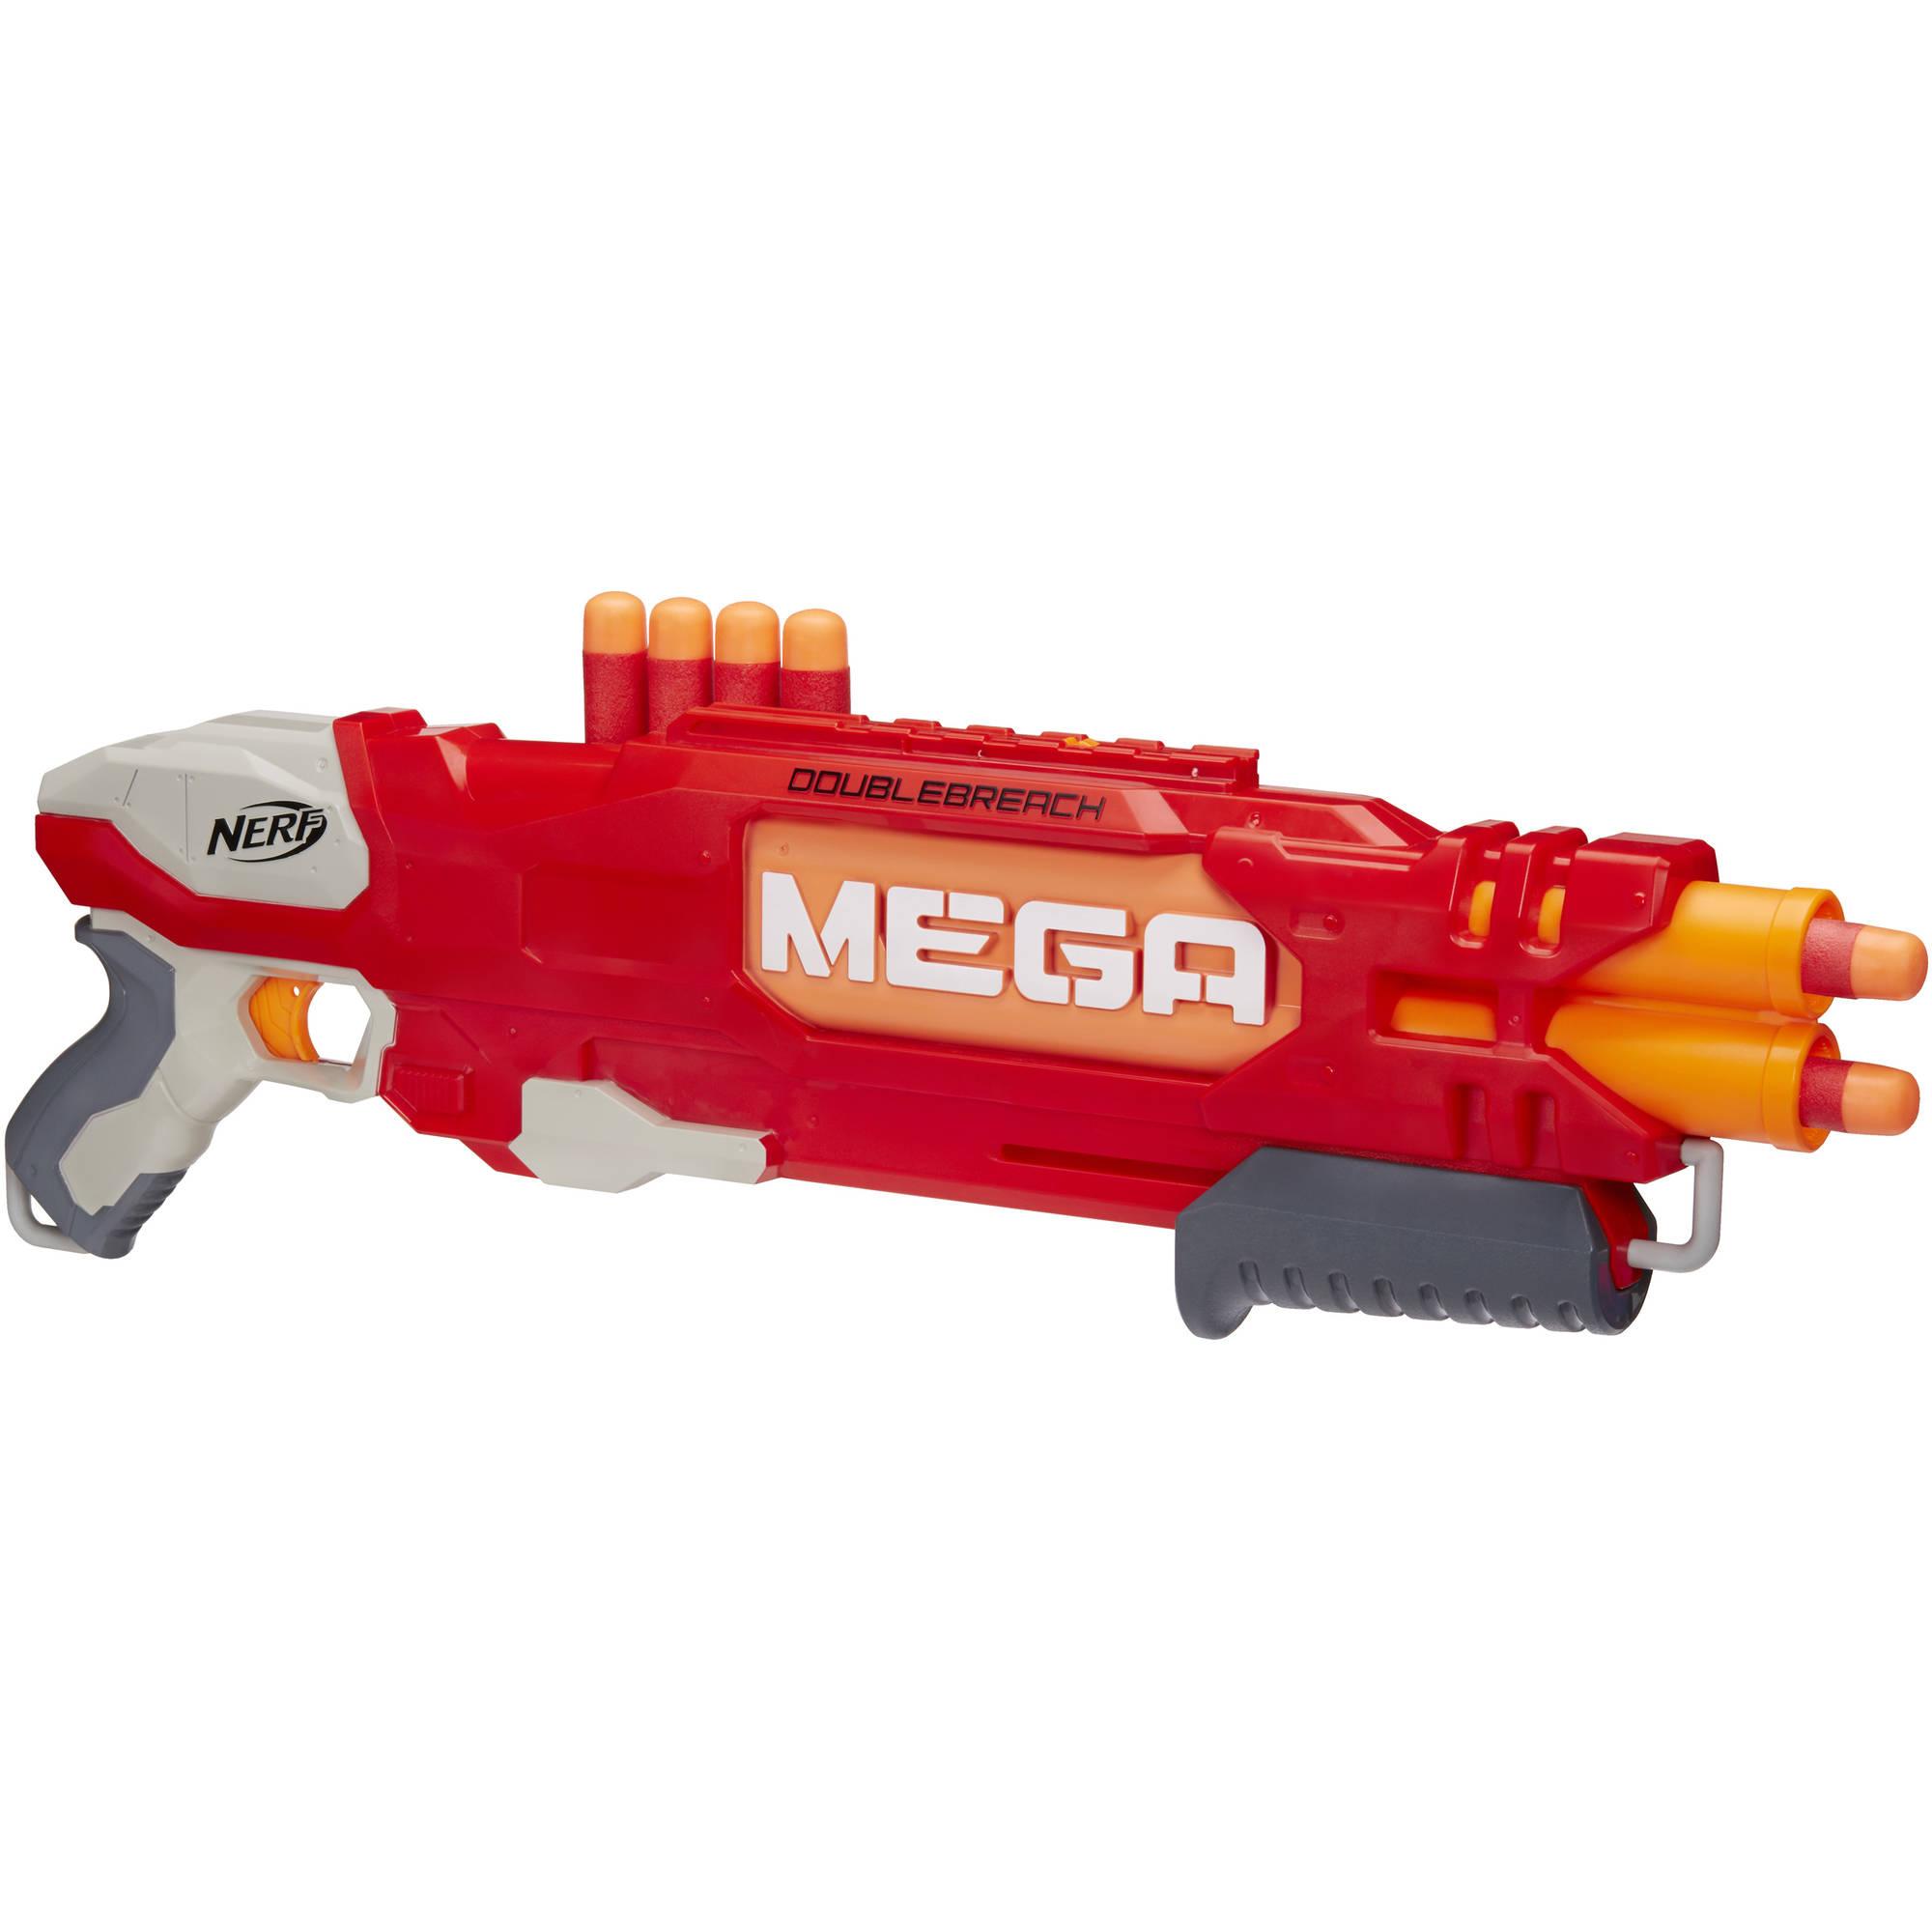 Nerf Mega Doublebreach.jpeg